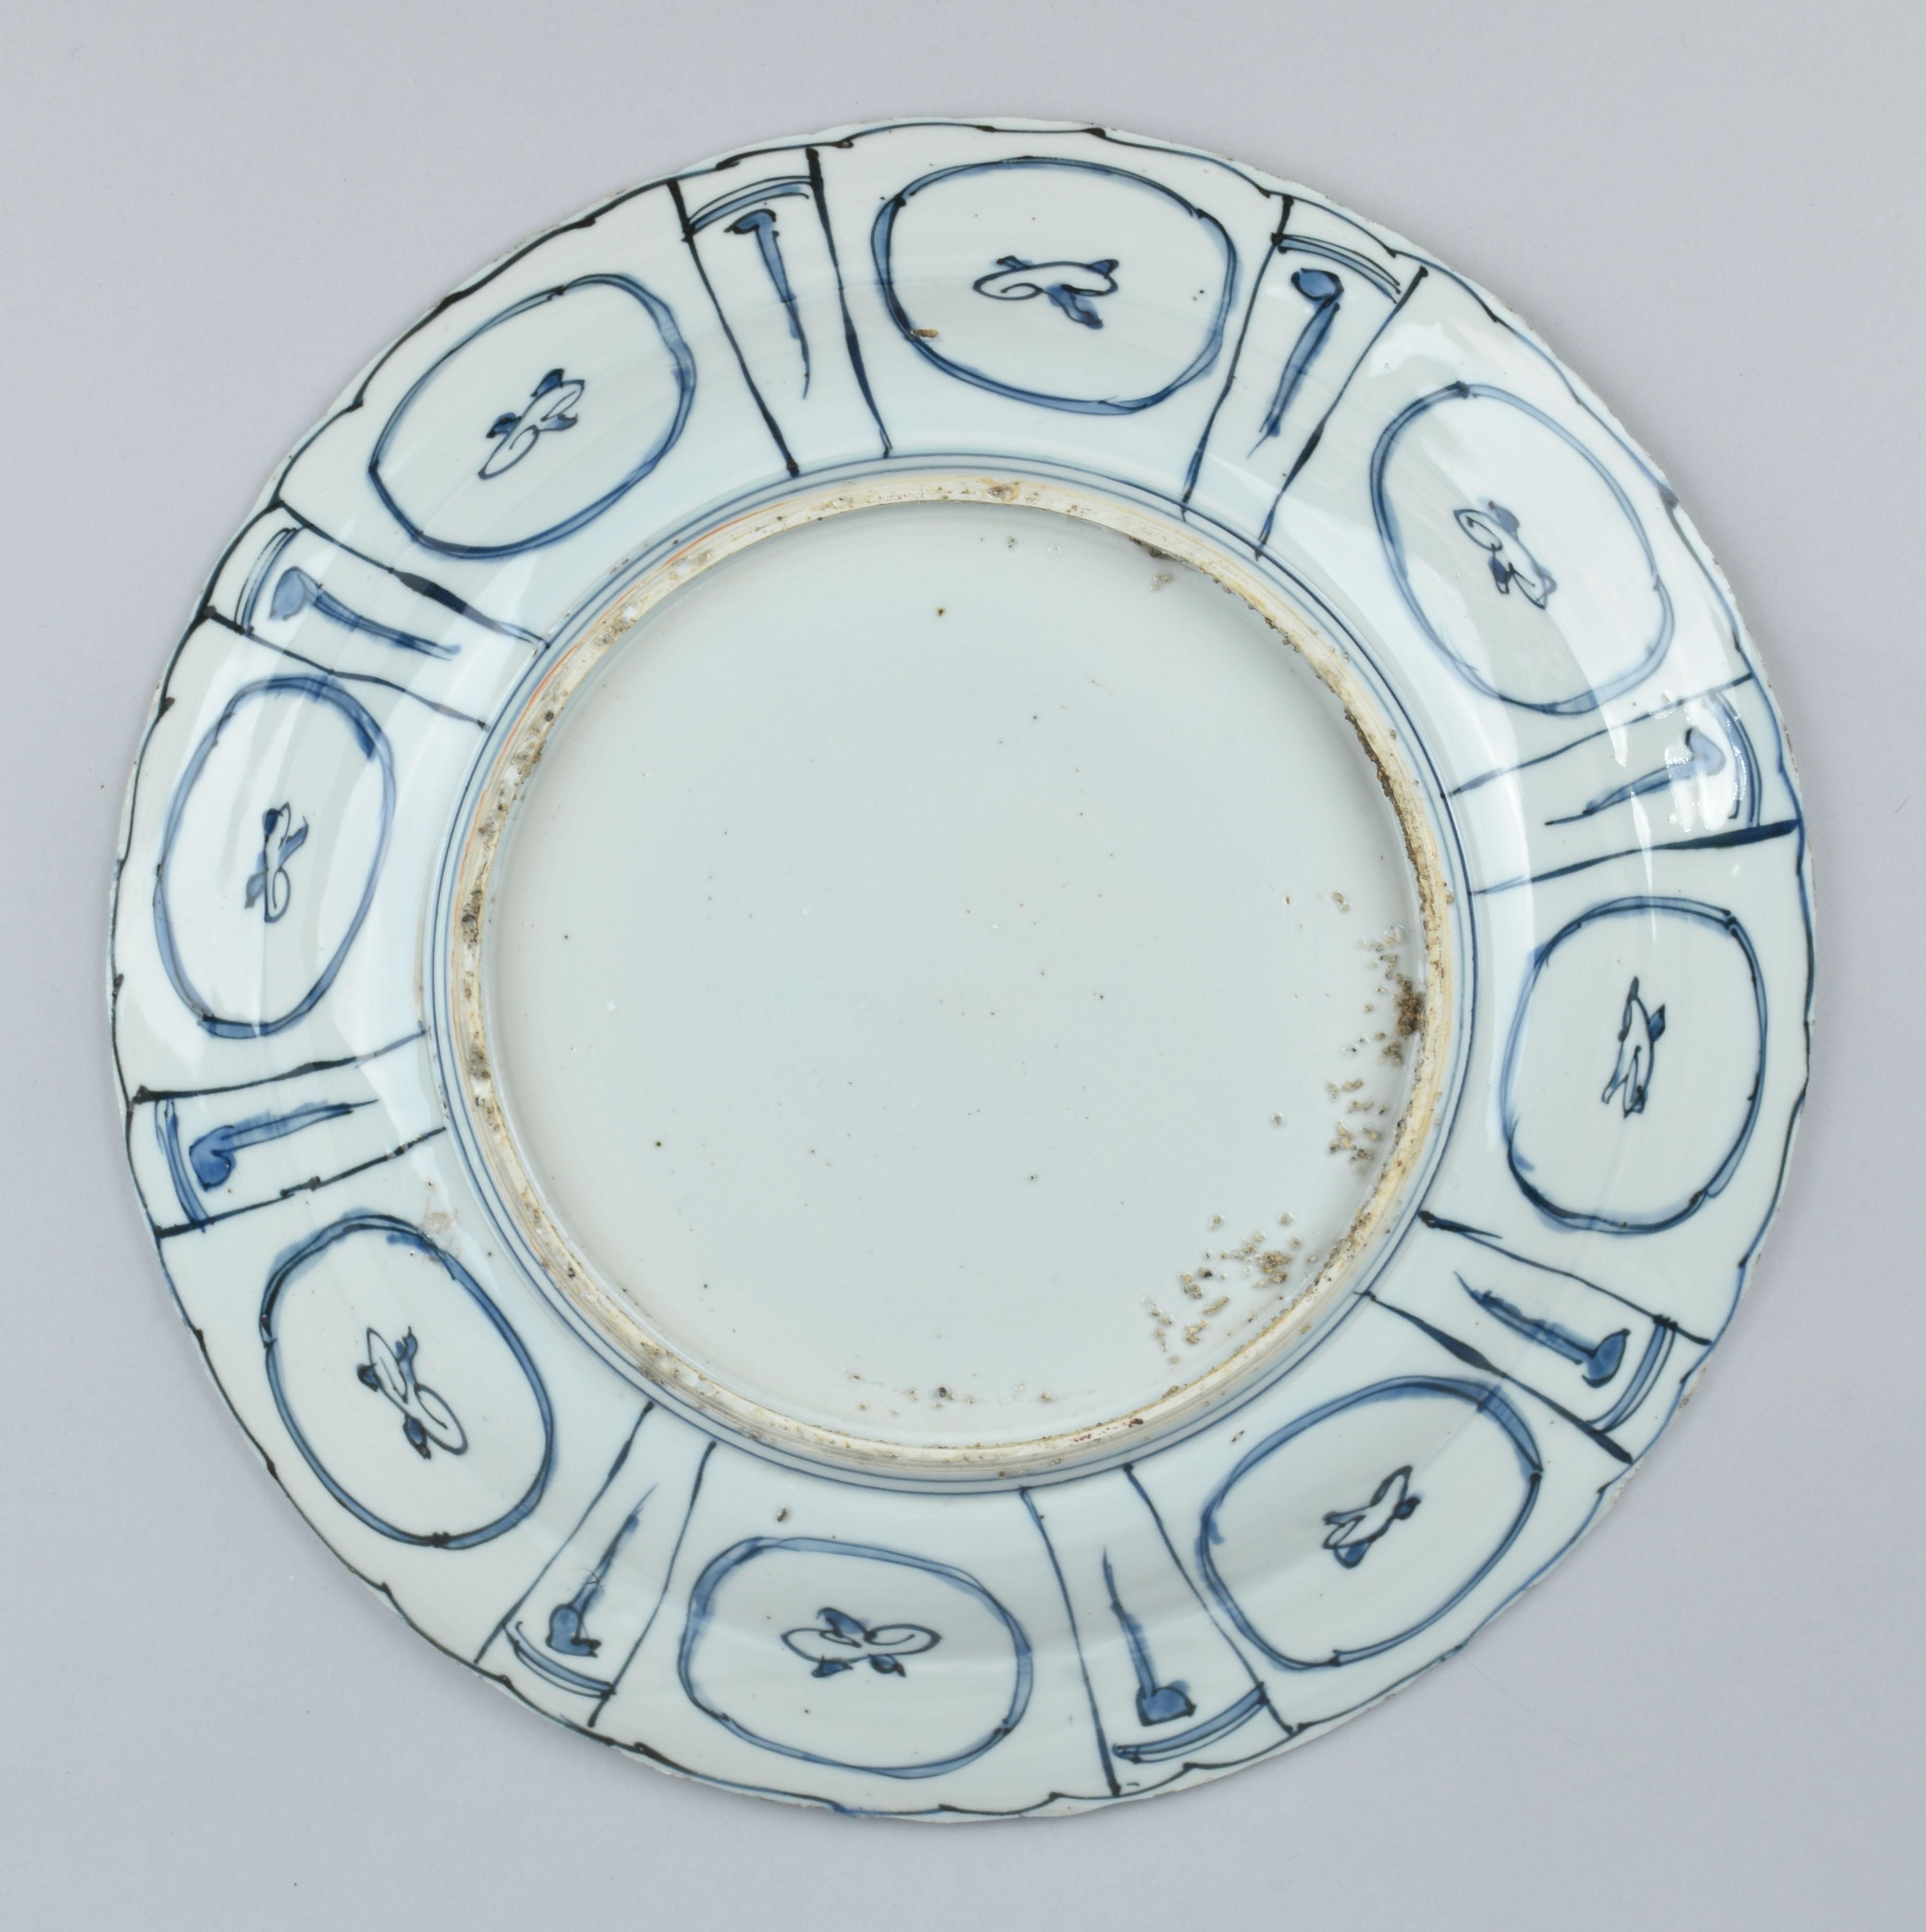 Porcelaine Dynastie Ming, époque Wanli (1573-1619), China